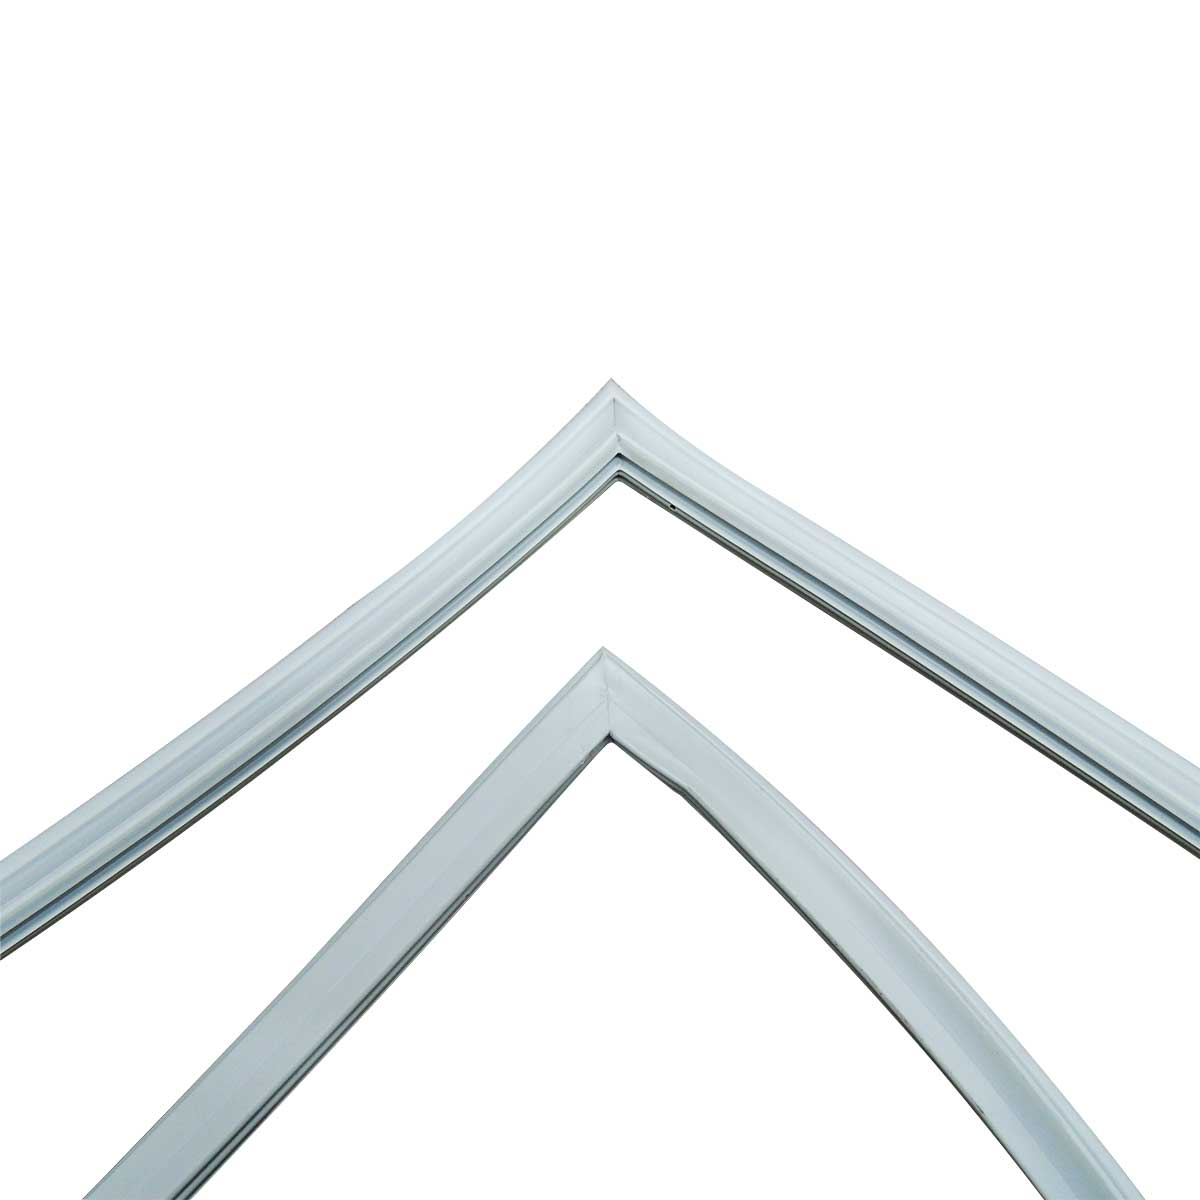 GAXETA METALFRIO VN28T 50,5x152 perfil interno 020207G091